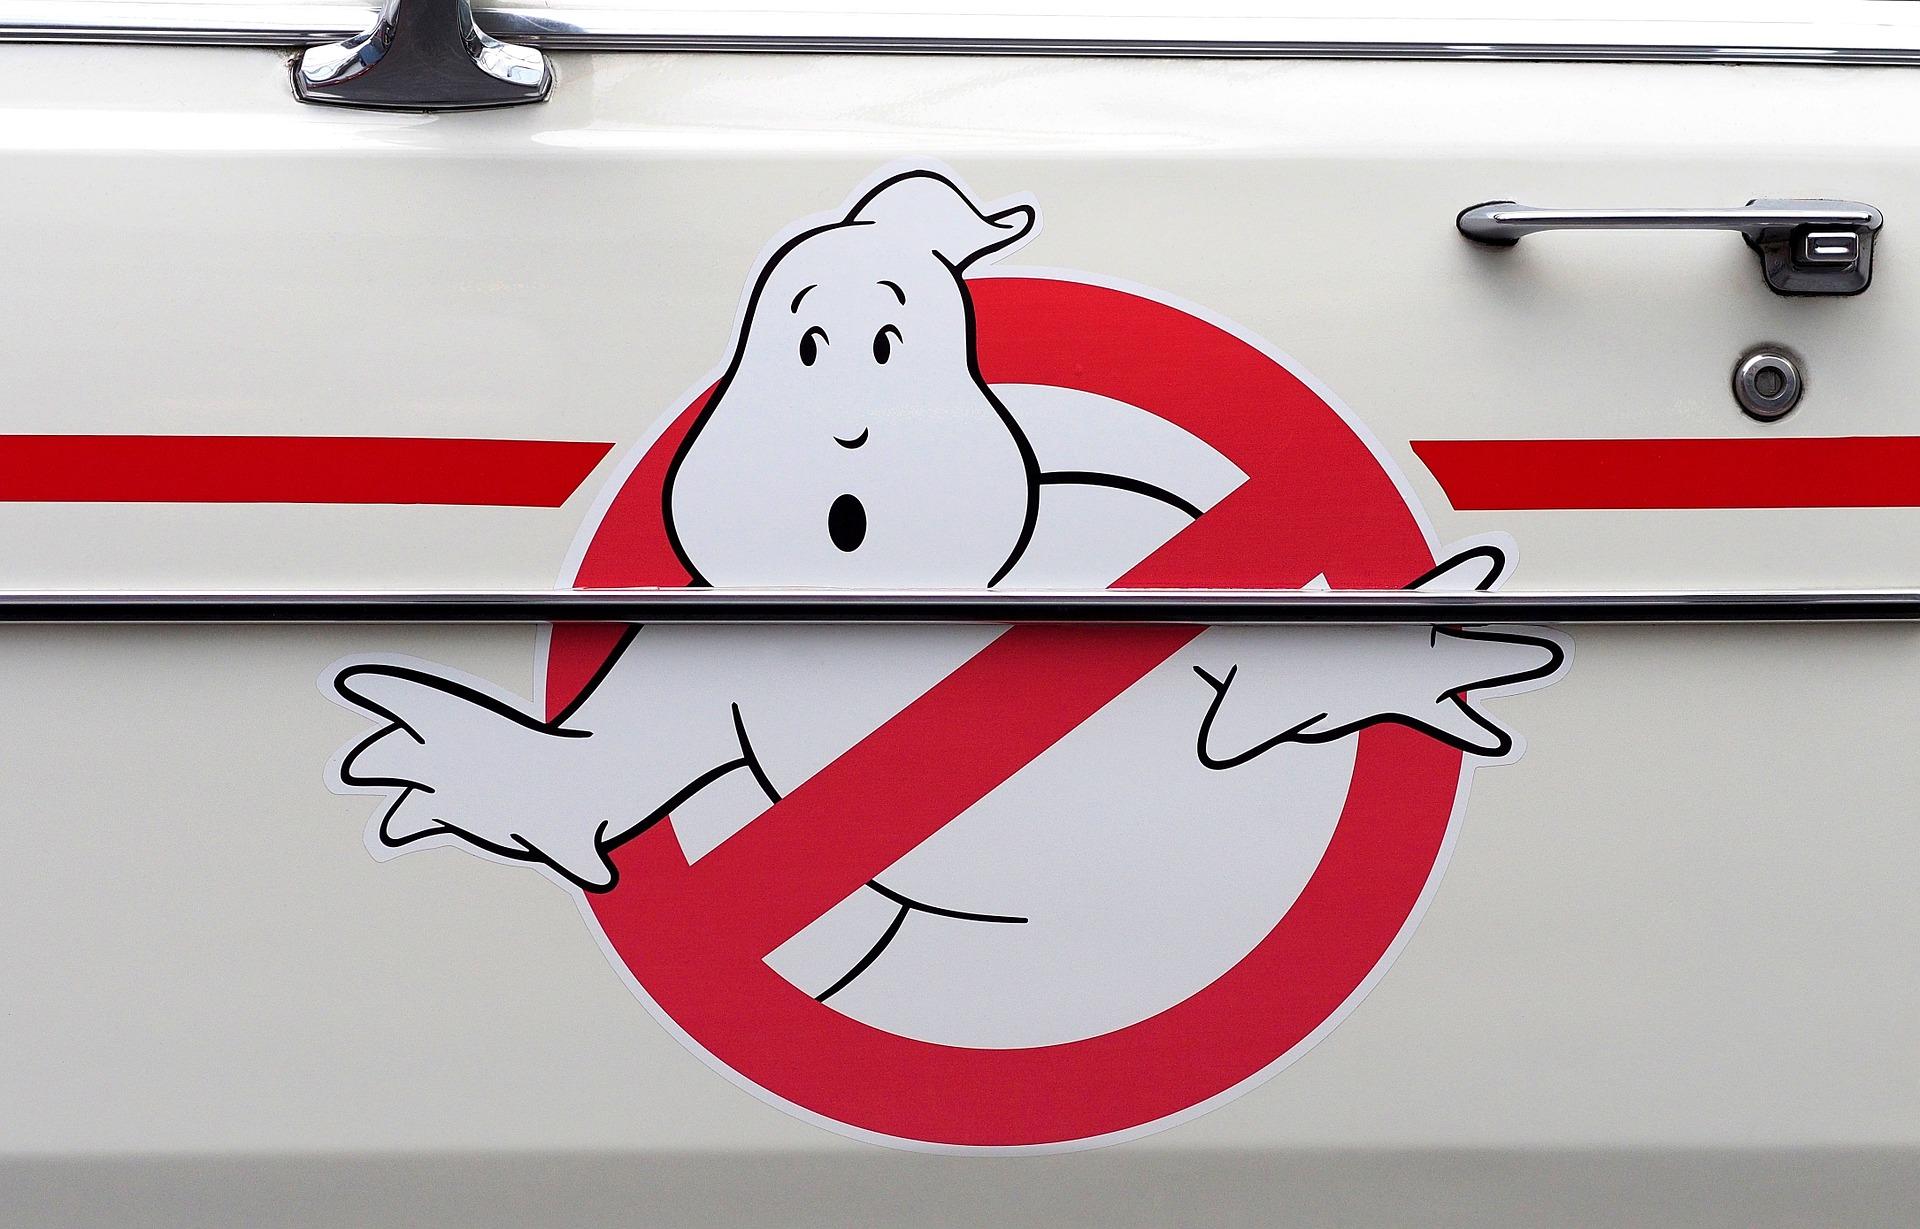 Ghostbusters, λογότυπο, αυτοκίνητο, Cadillac, νοσταλγία - Wallpapers HD - Professor-falken.com